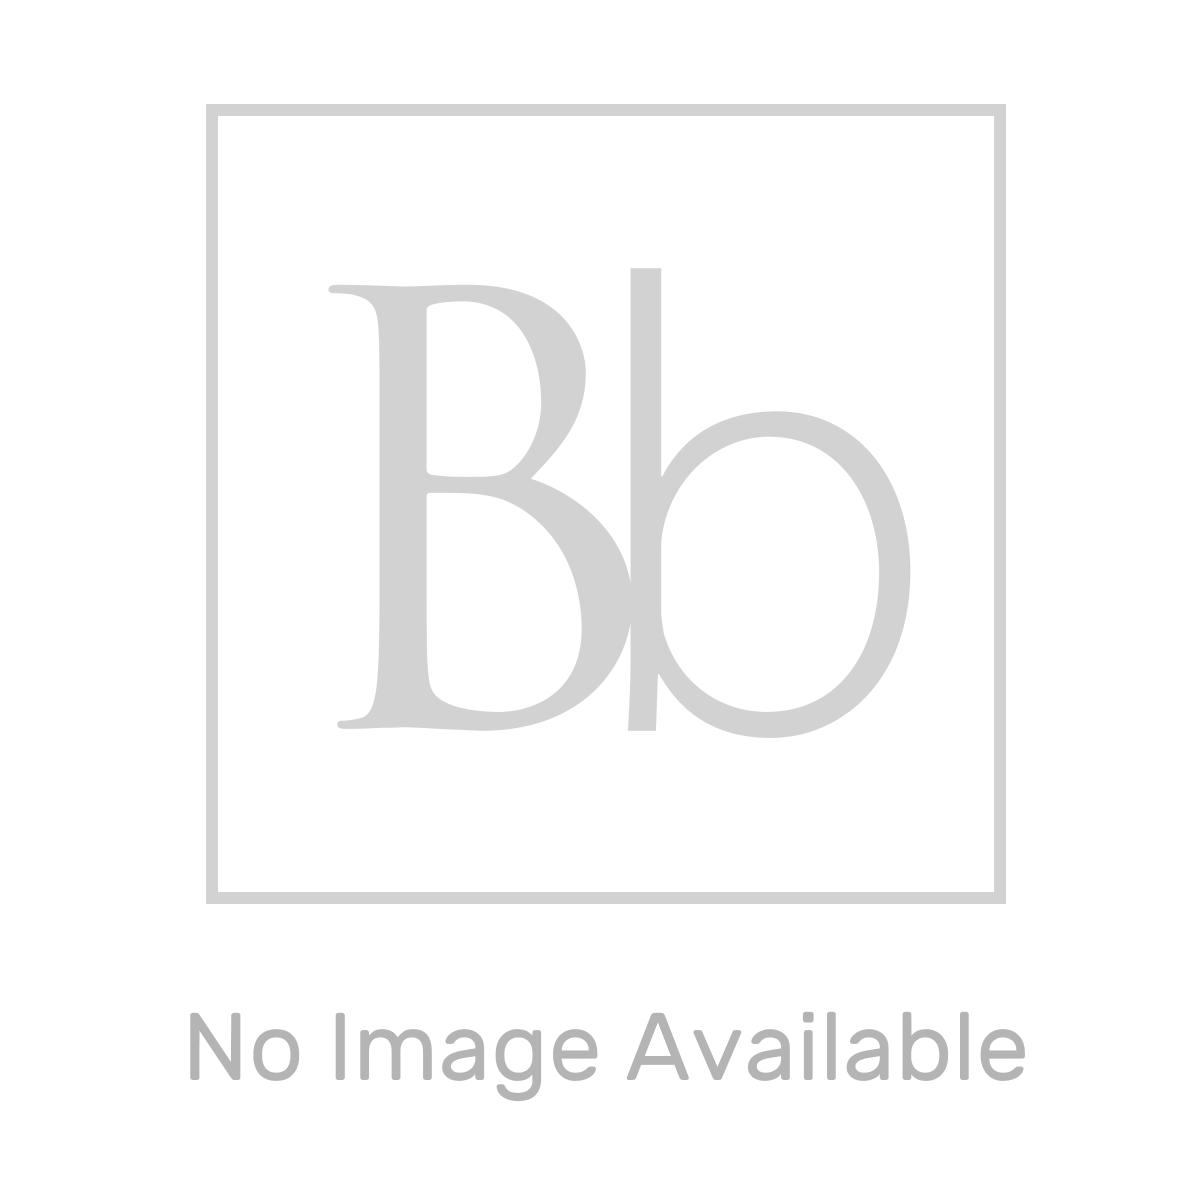 HiB Rossi Magnifying Mirror